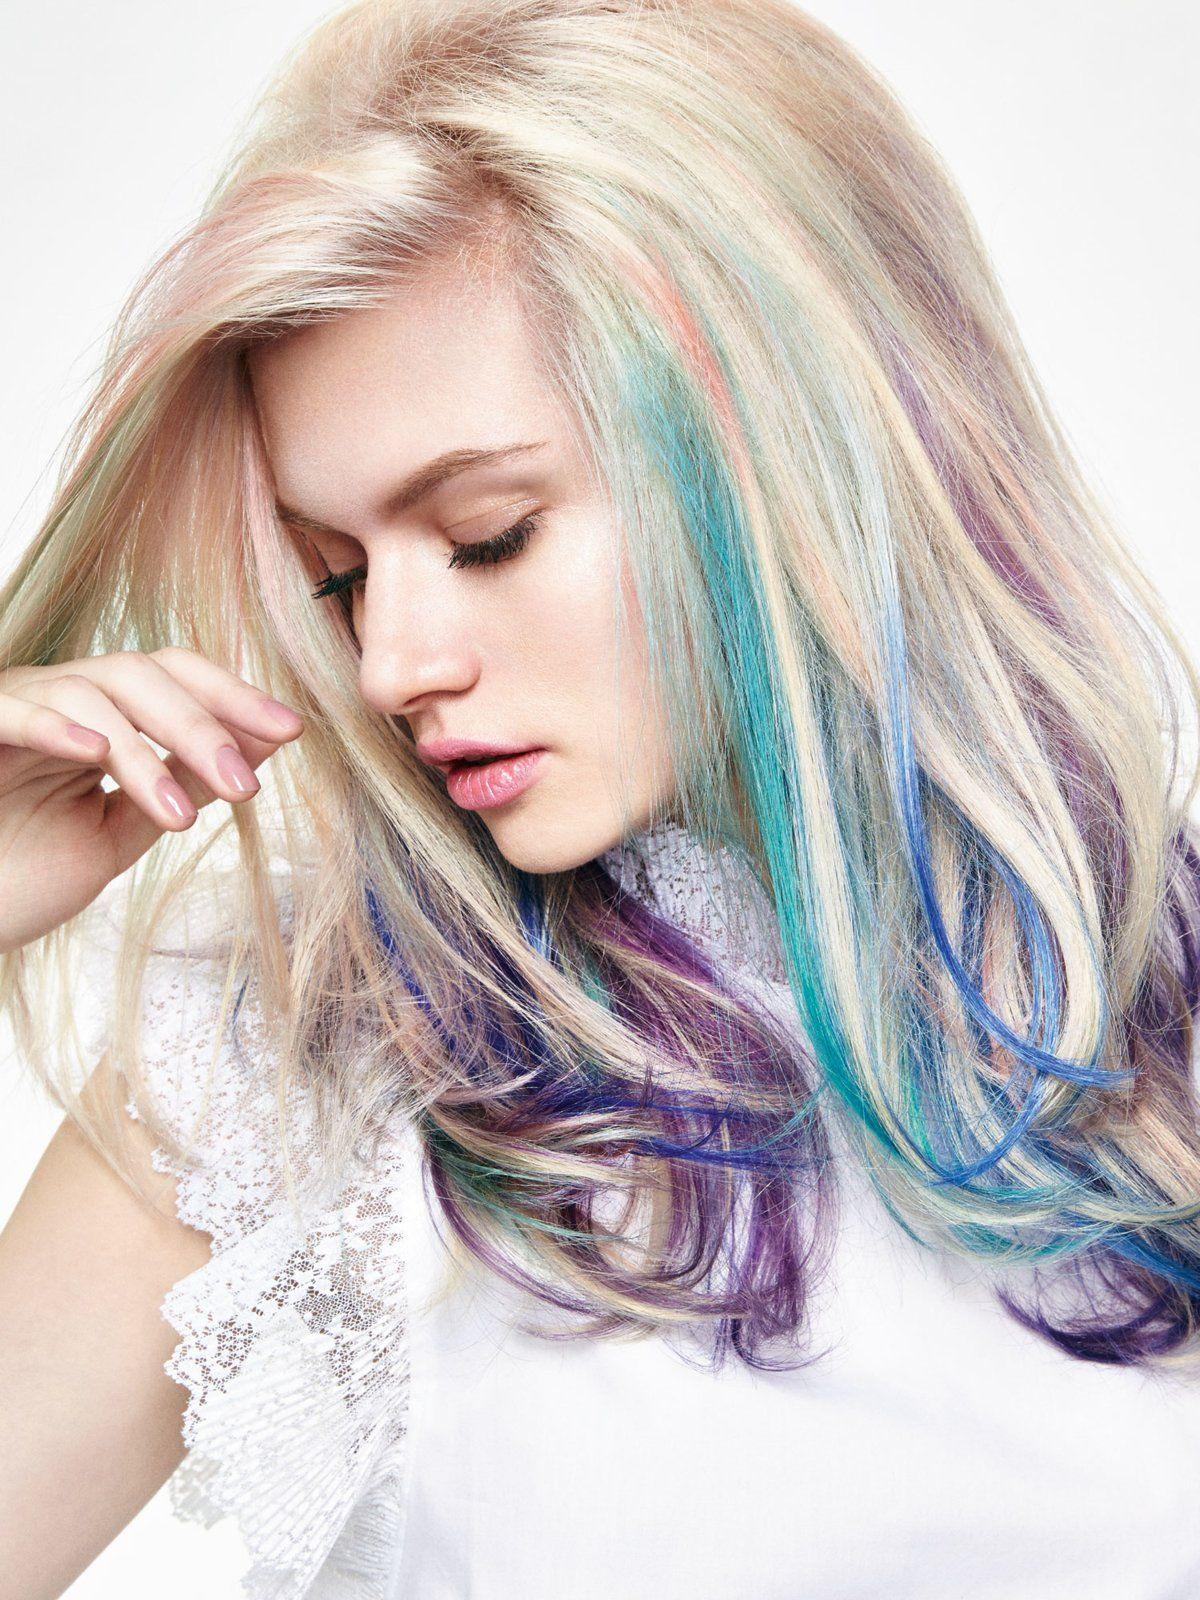 Haarfarben 2017 so sehen Trends an echten Frauen aus